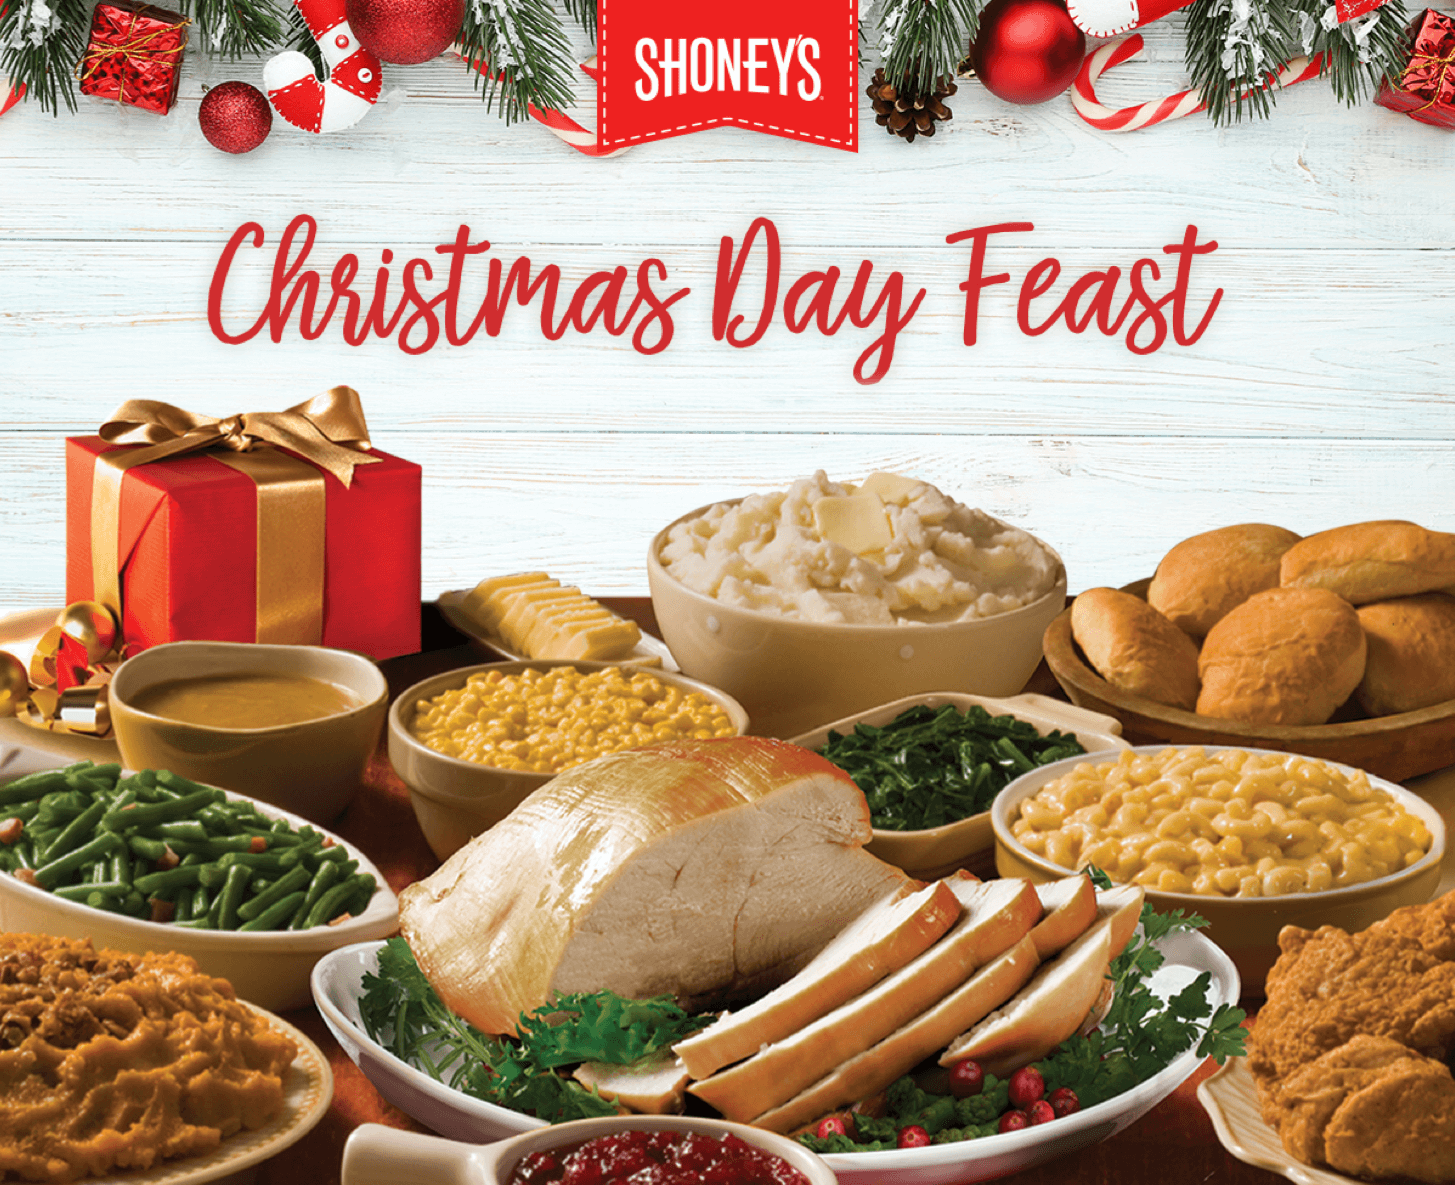 Shoney's Christmas Day Feast